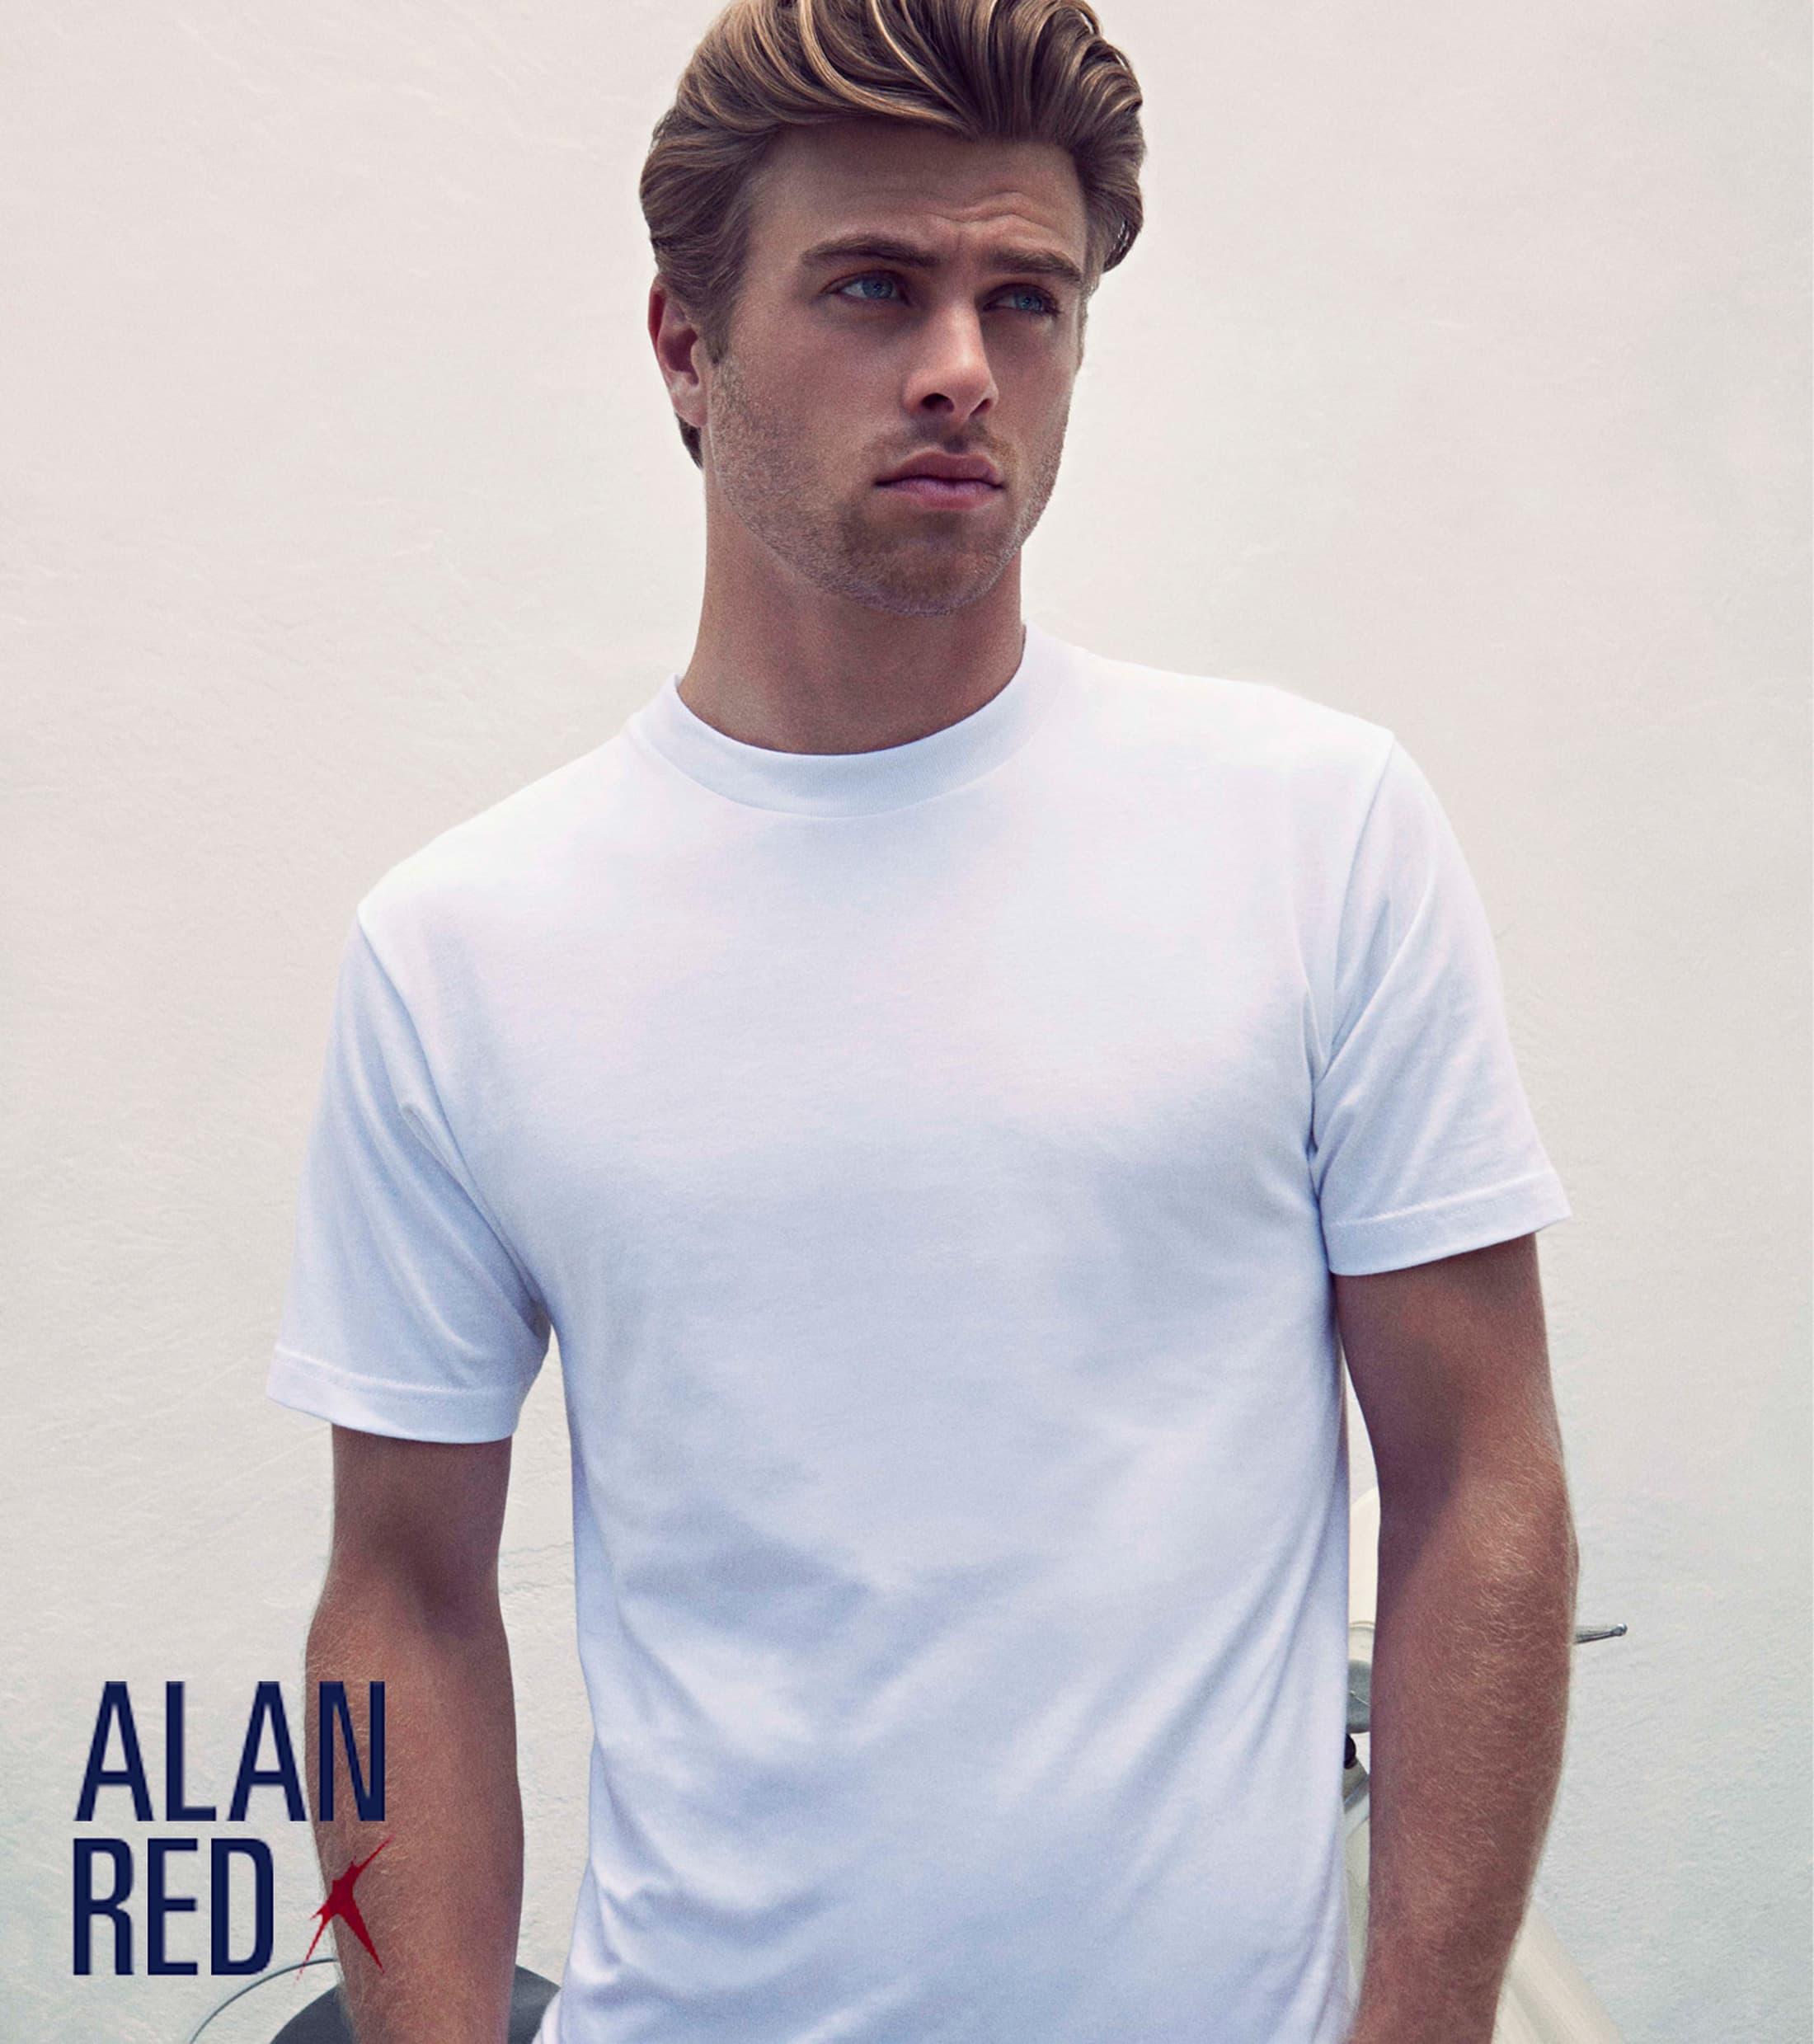 Alan Red T-shirt Virginia Black 1-Pack foto 3